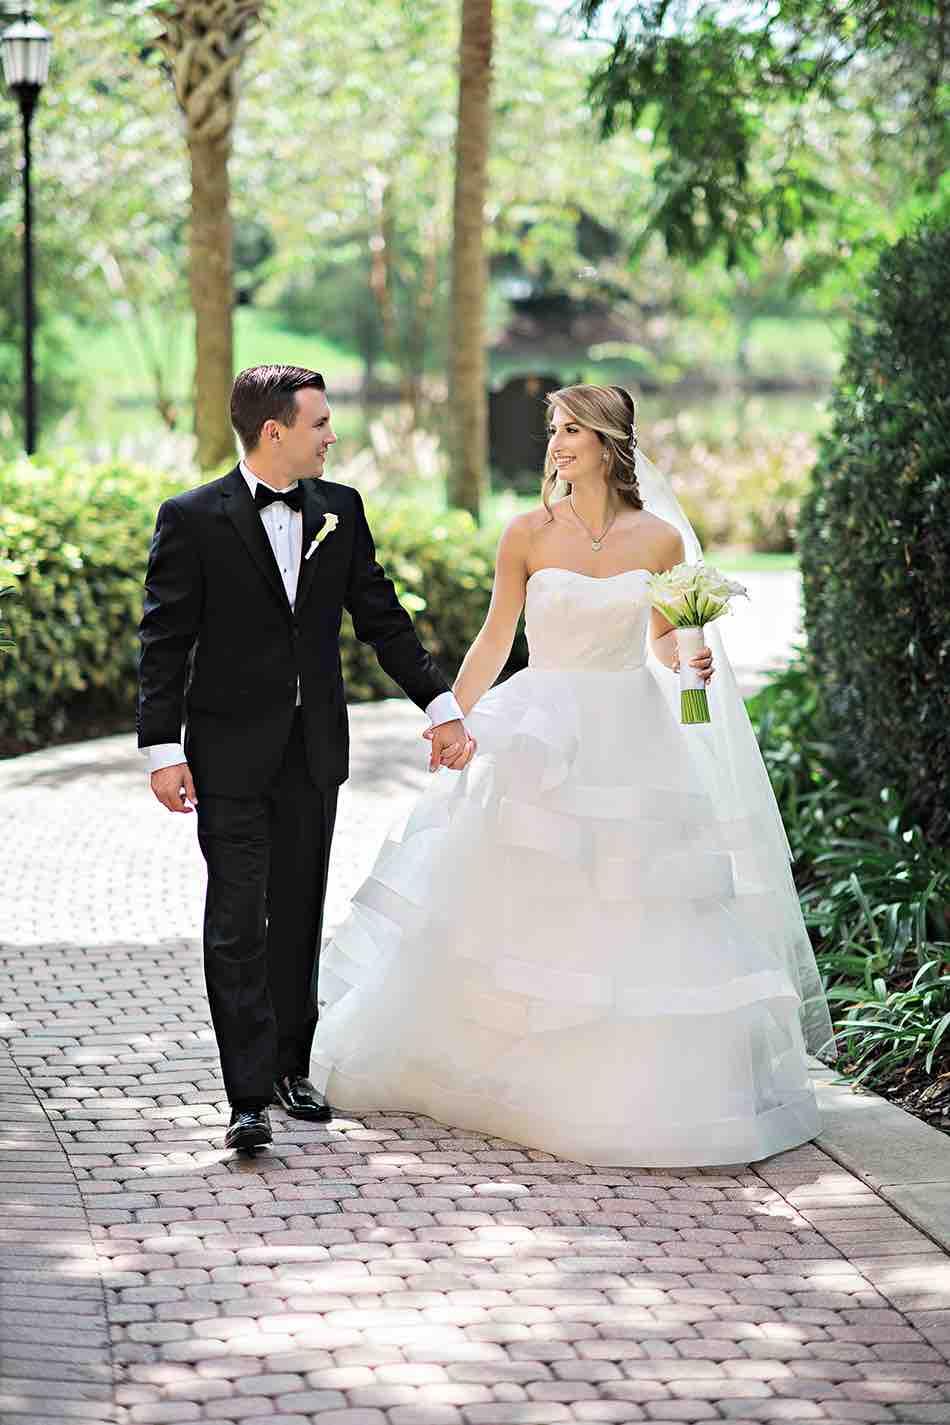 JW Marriott Black and White Jewish Wedding - A Chair Affair, Inc.